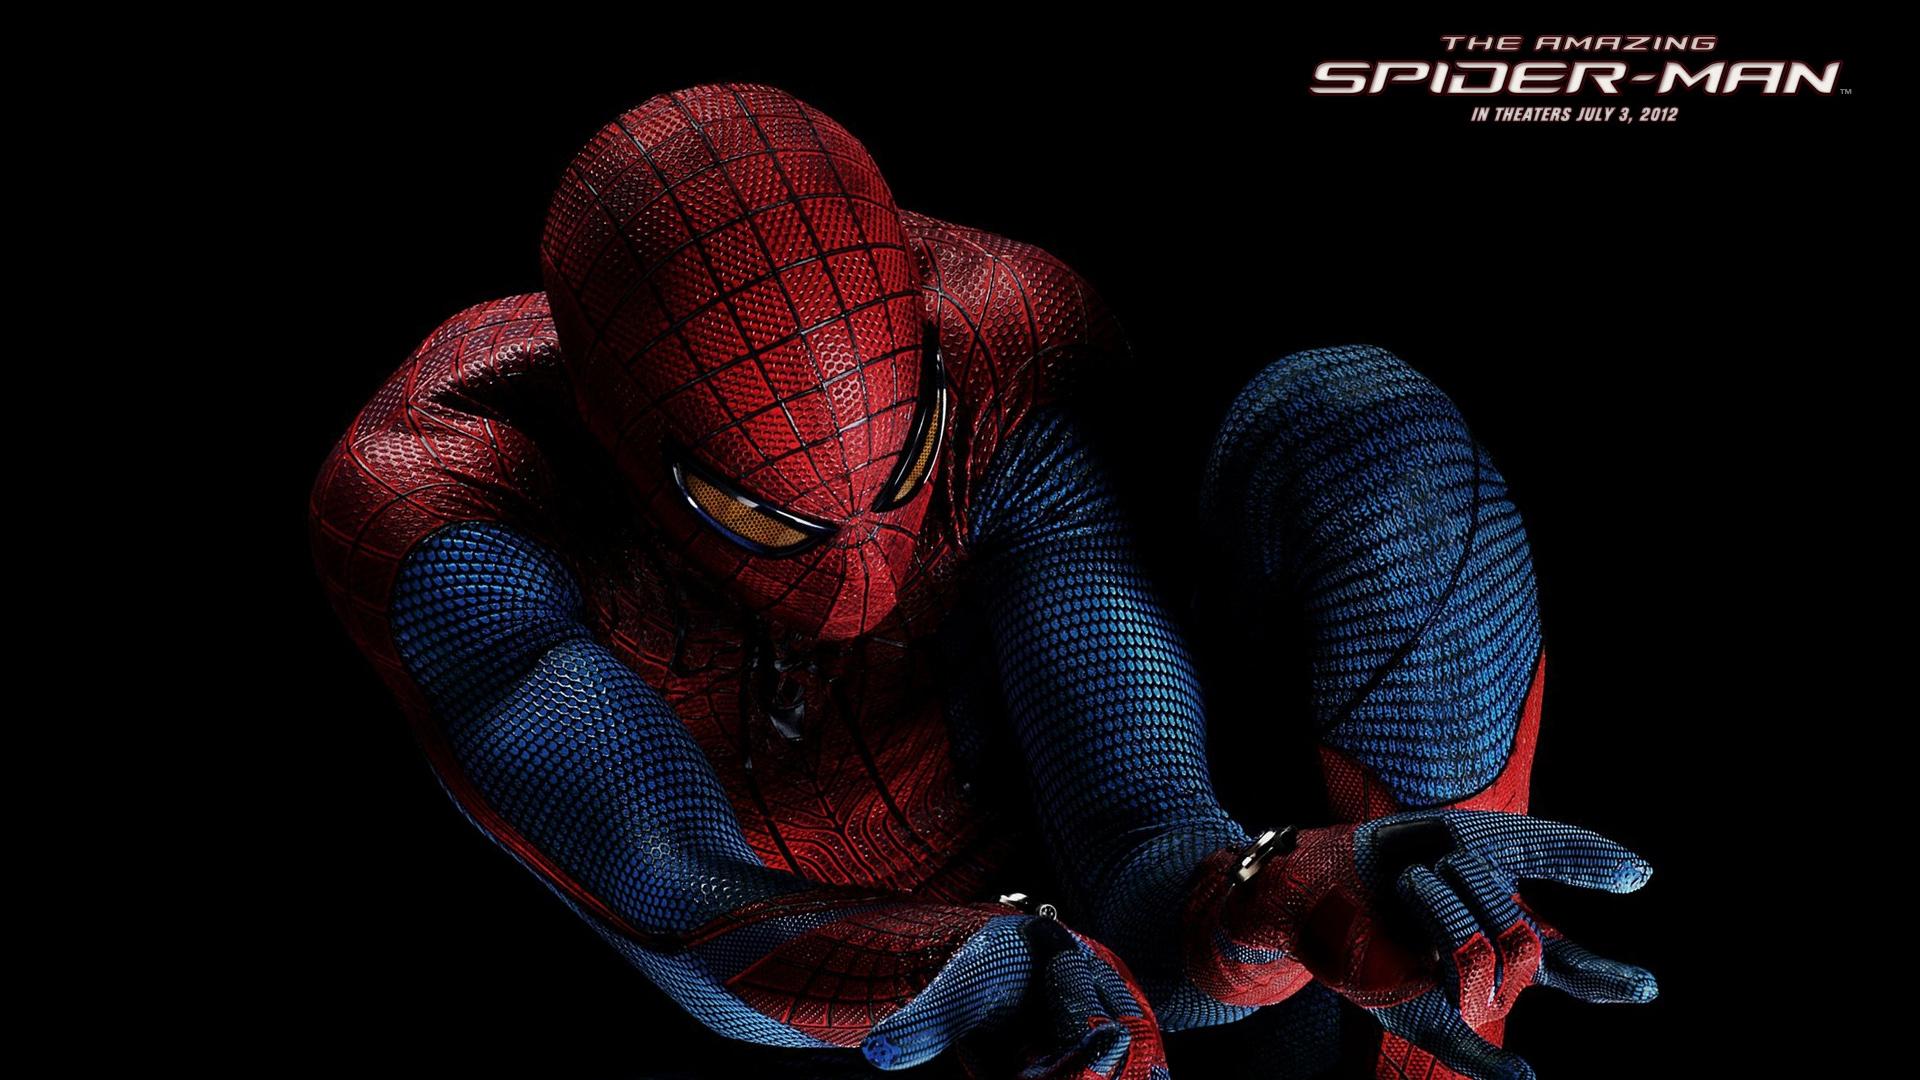 The Amazing Spider Man Wallpaper HD Desktop Background 1920x1080